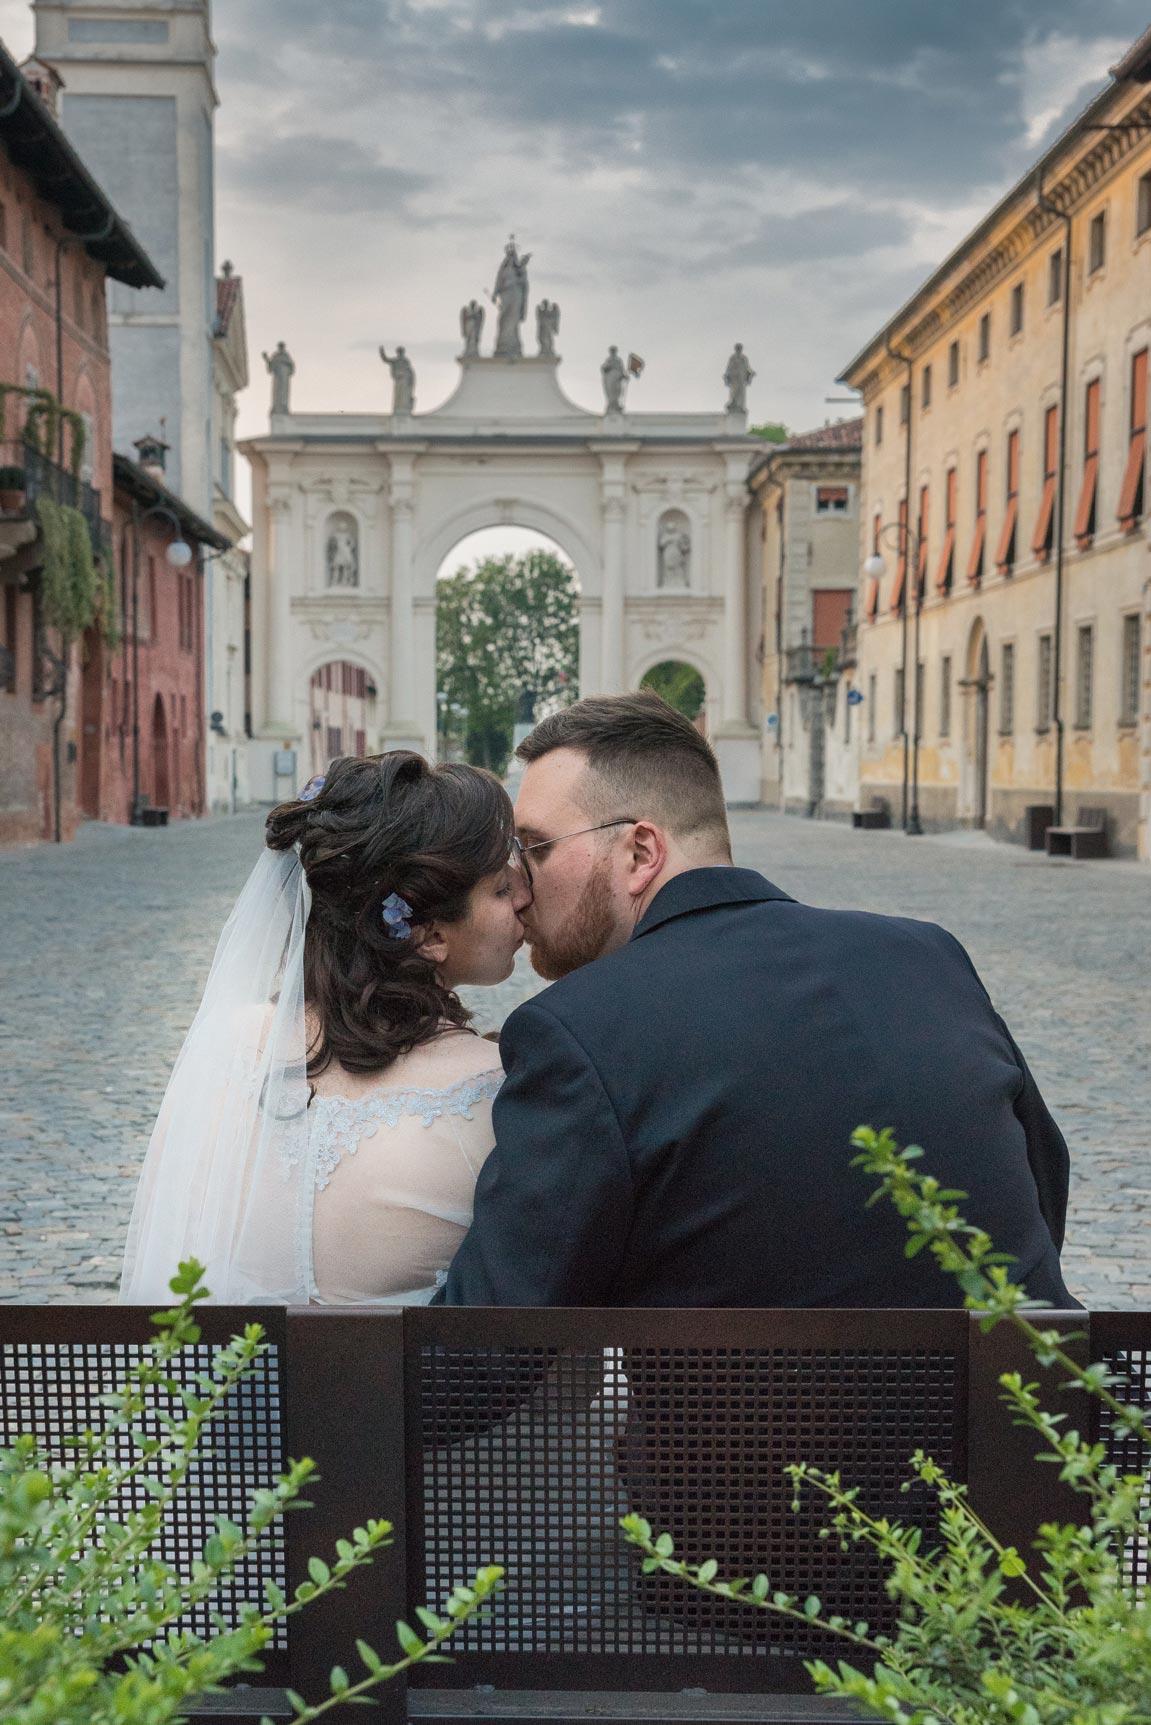 Matrimonio a Narzole Lorenza Diego - DSC 3383 - Fotografo matrimonio Cherasco - Fotografo matrimonio Cherasco